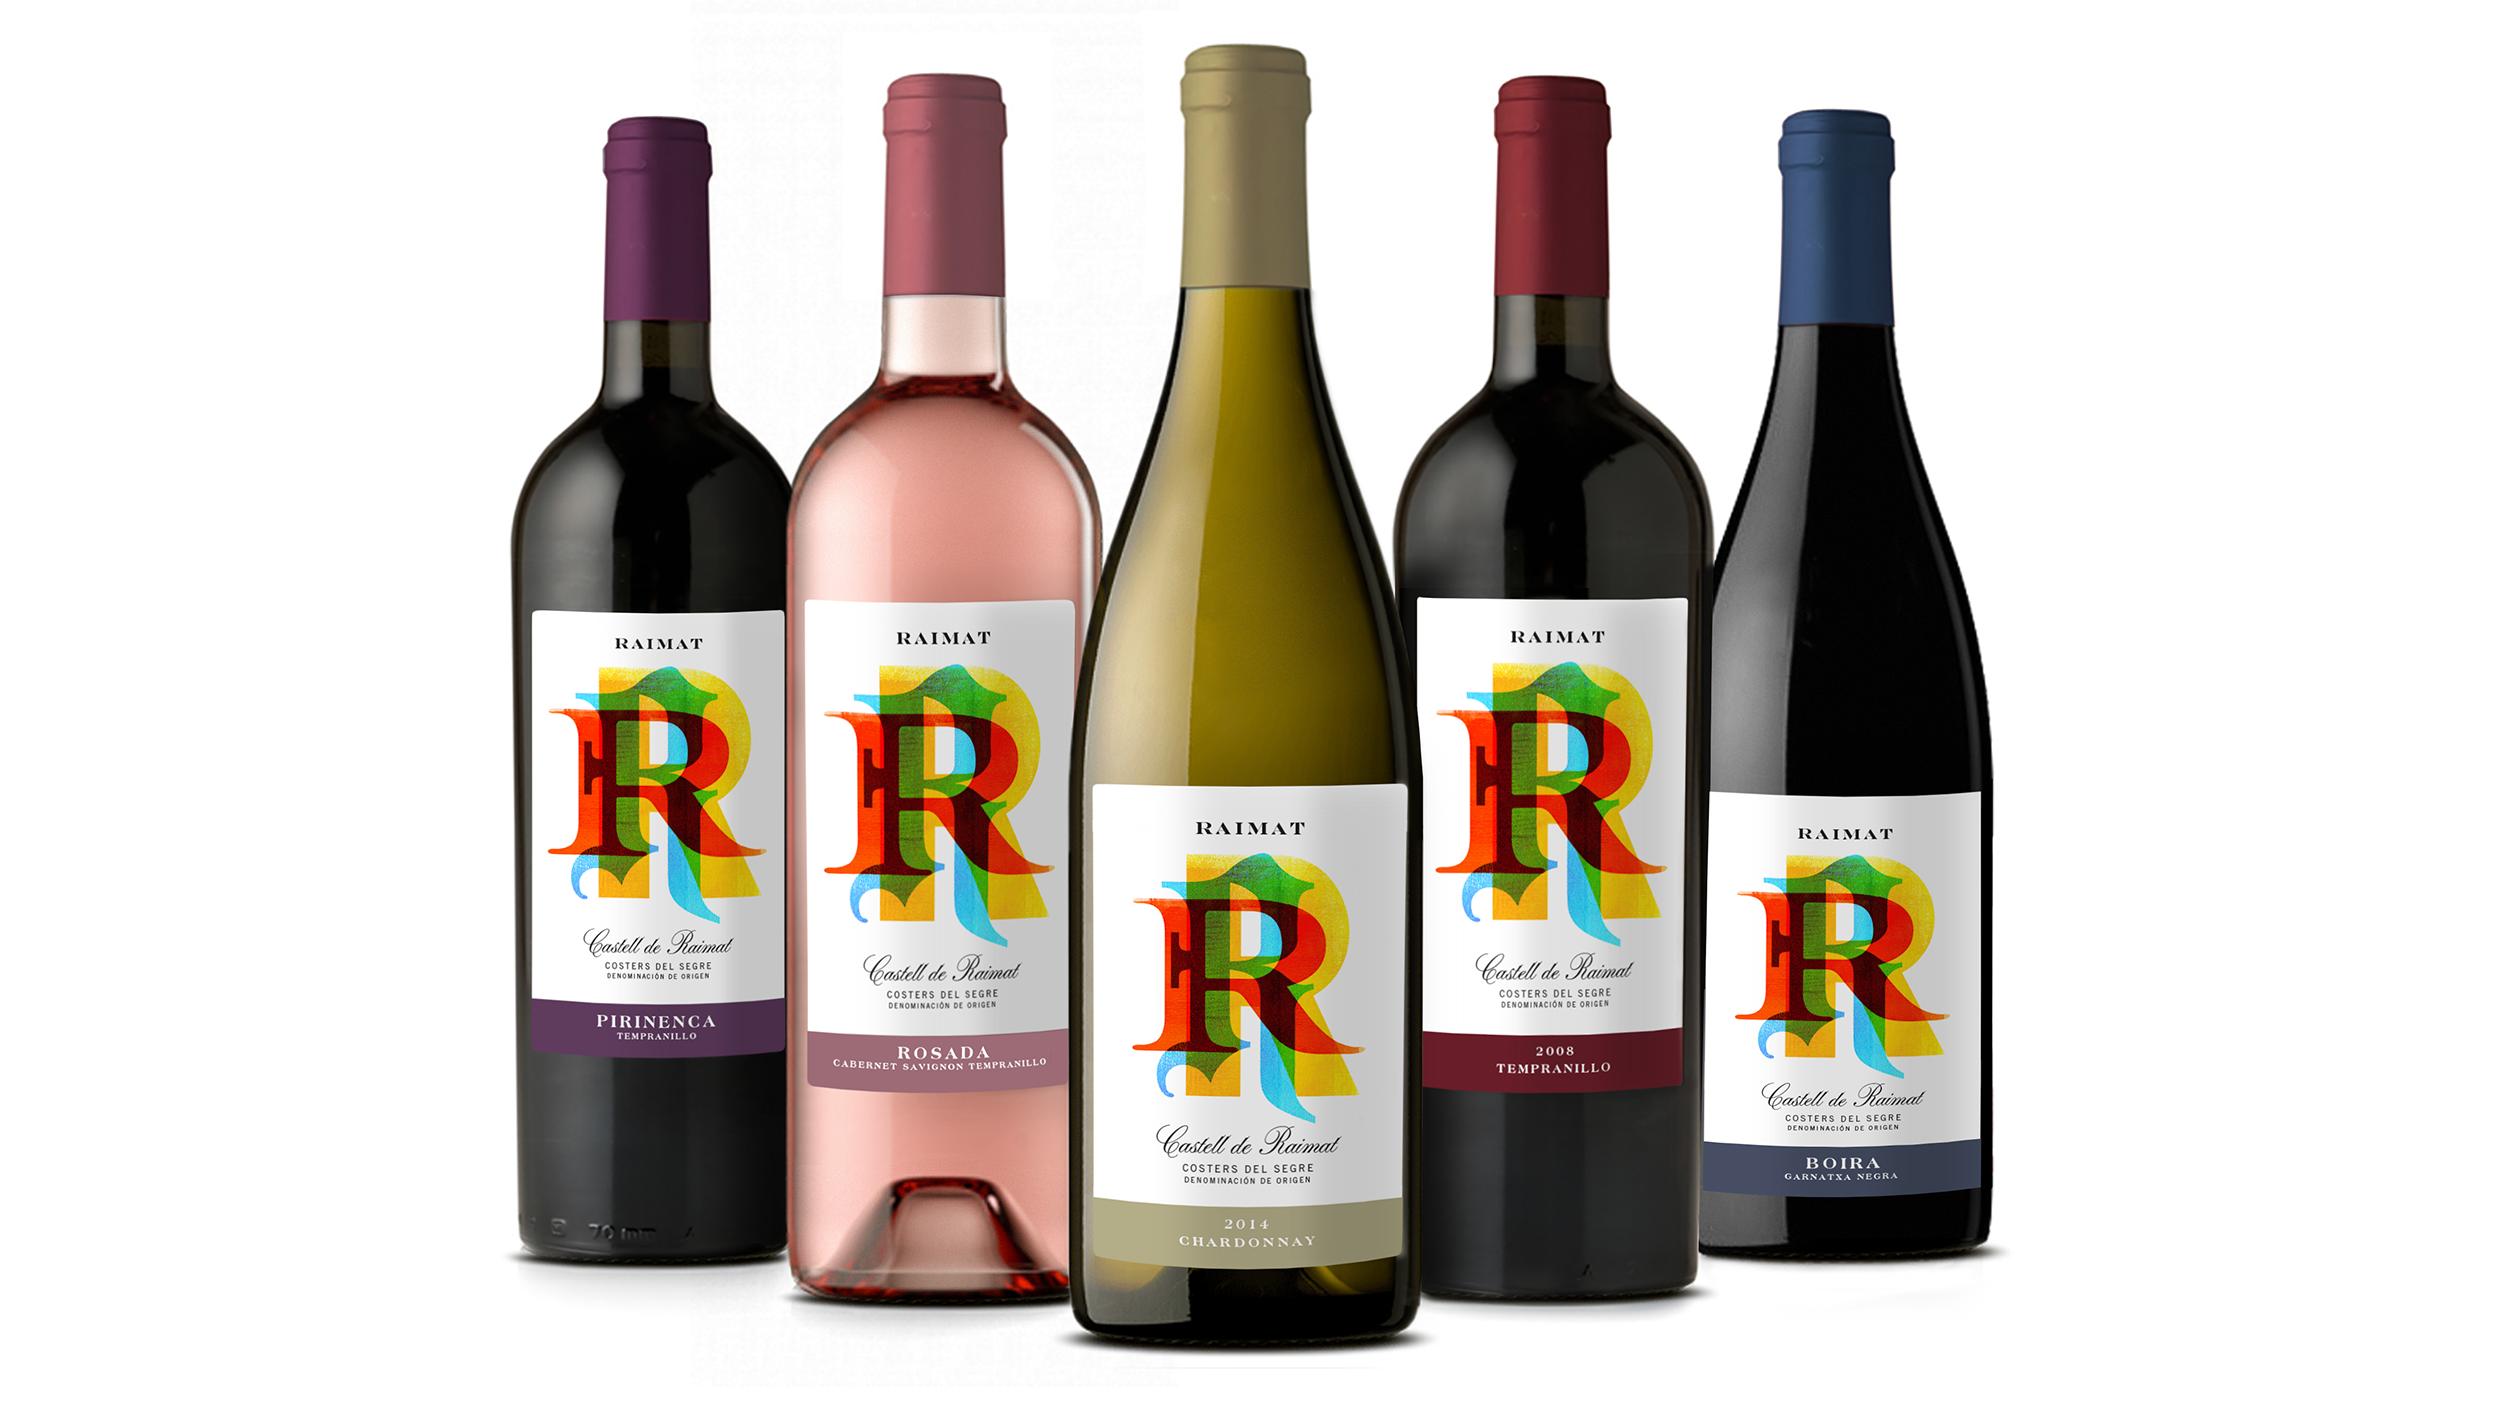 Raimat Wine bottle design